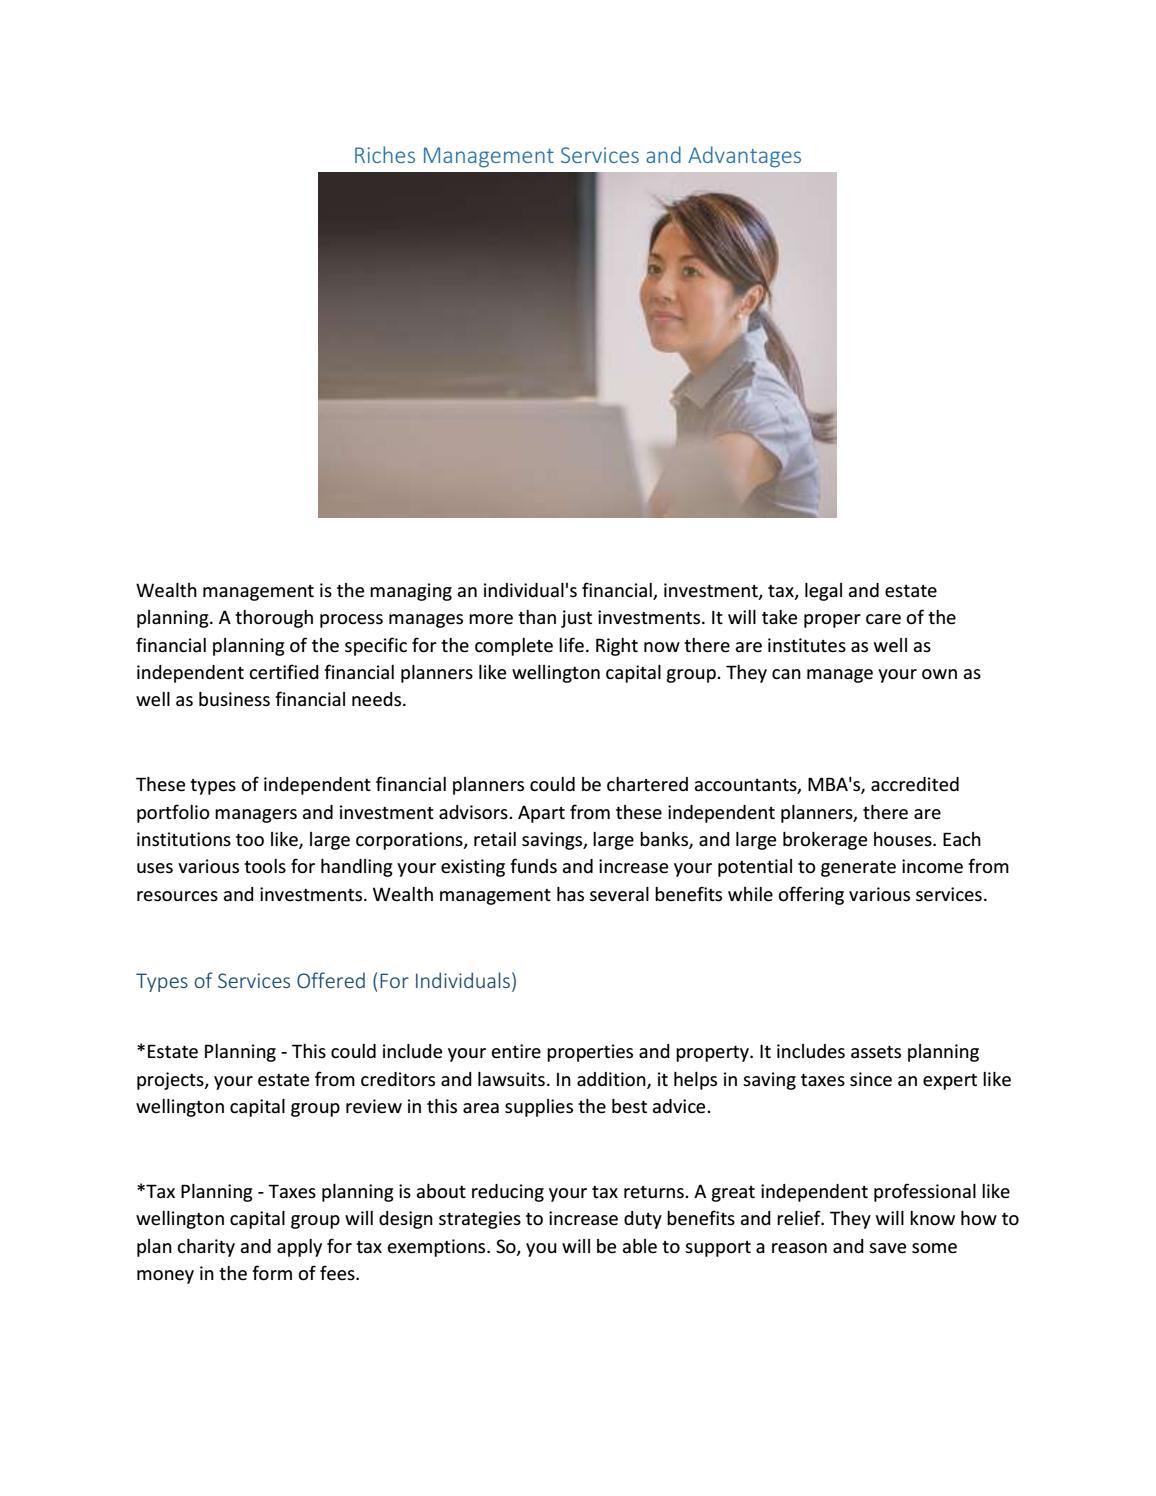 Wellington capital group review by wellingtoncapitalgroup - issuu